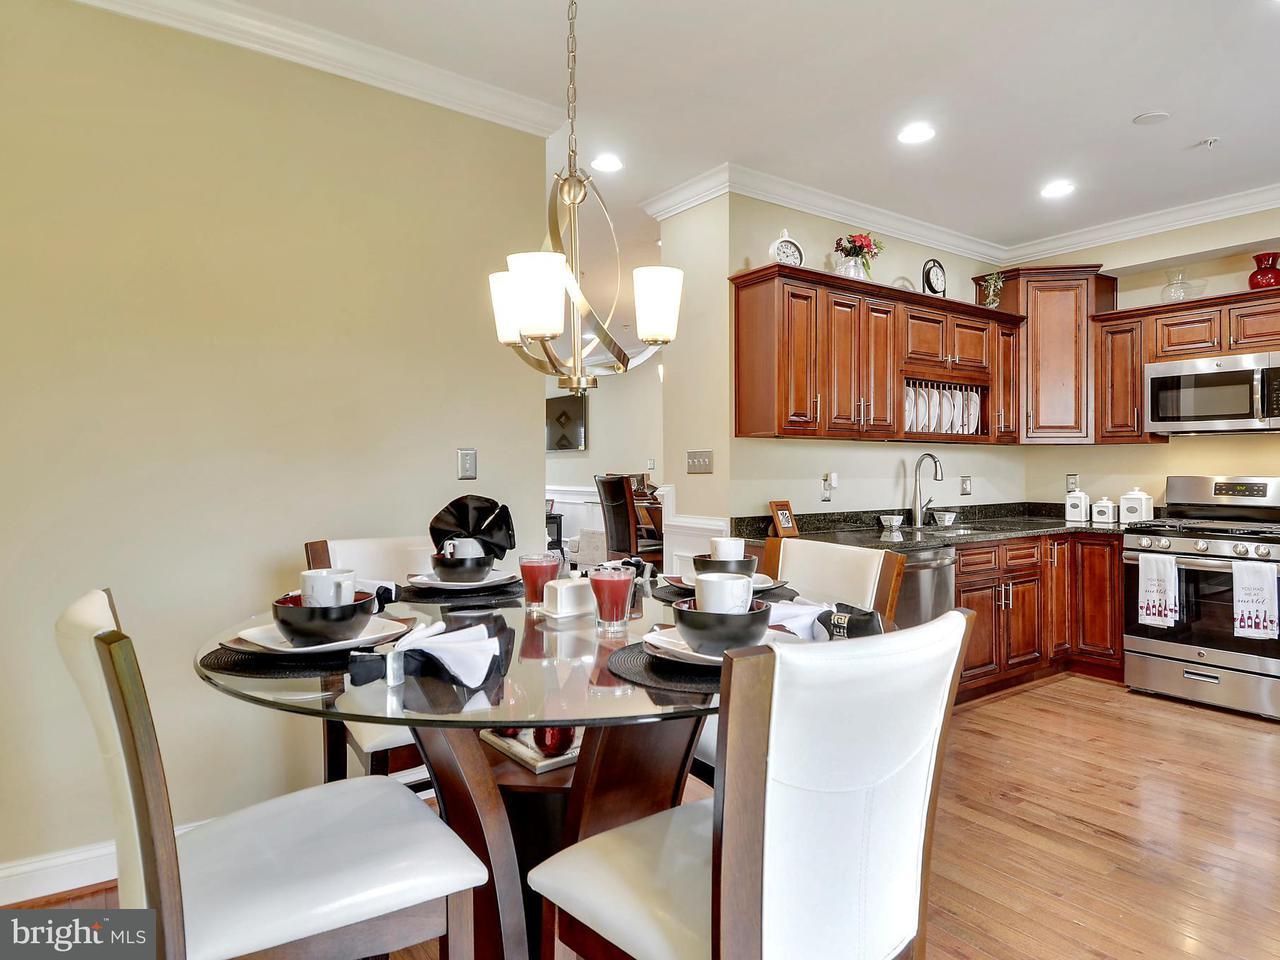 Additional photo for property listing at 5209 D ST SE 5209 D ST SE Washington, Distrito De Columbia 20019 Estados Unidos